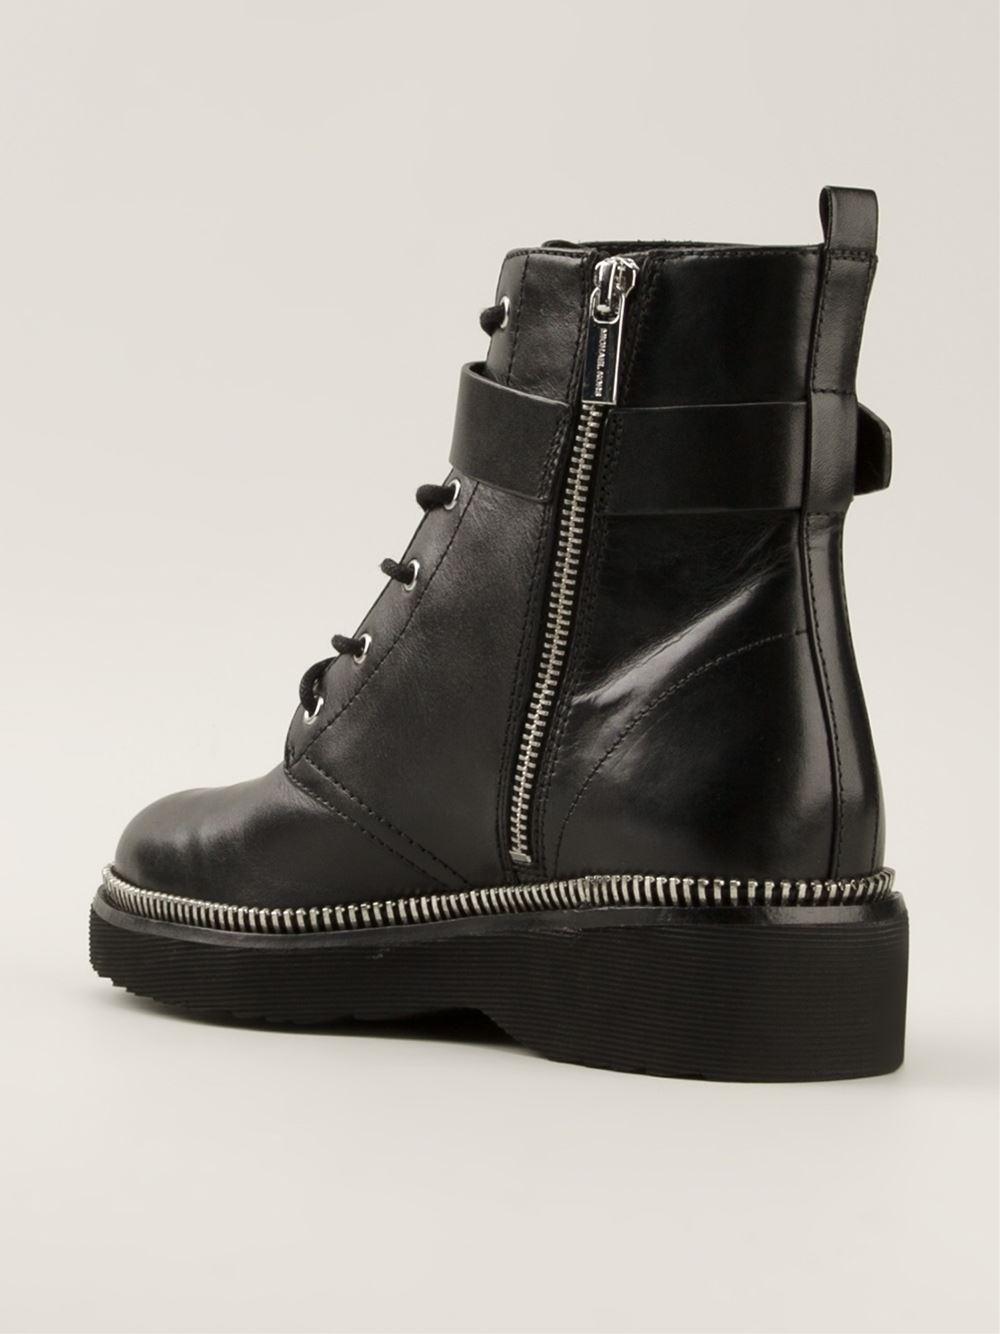 michael michael kors 39 vivia 39 ankle boots in black lyst. Black Bedroom Furniture Sets. Home Design Ideas